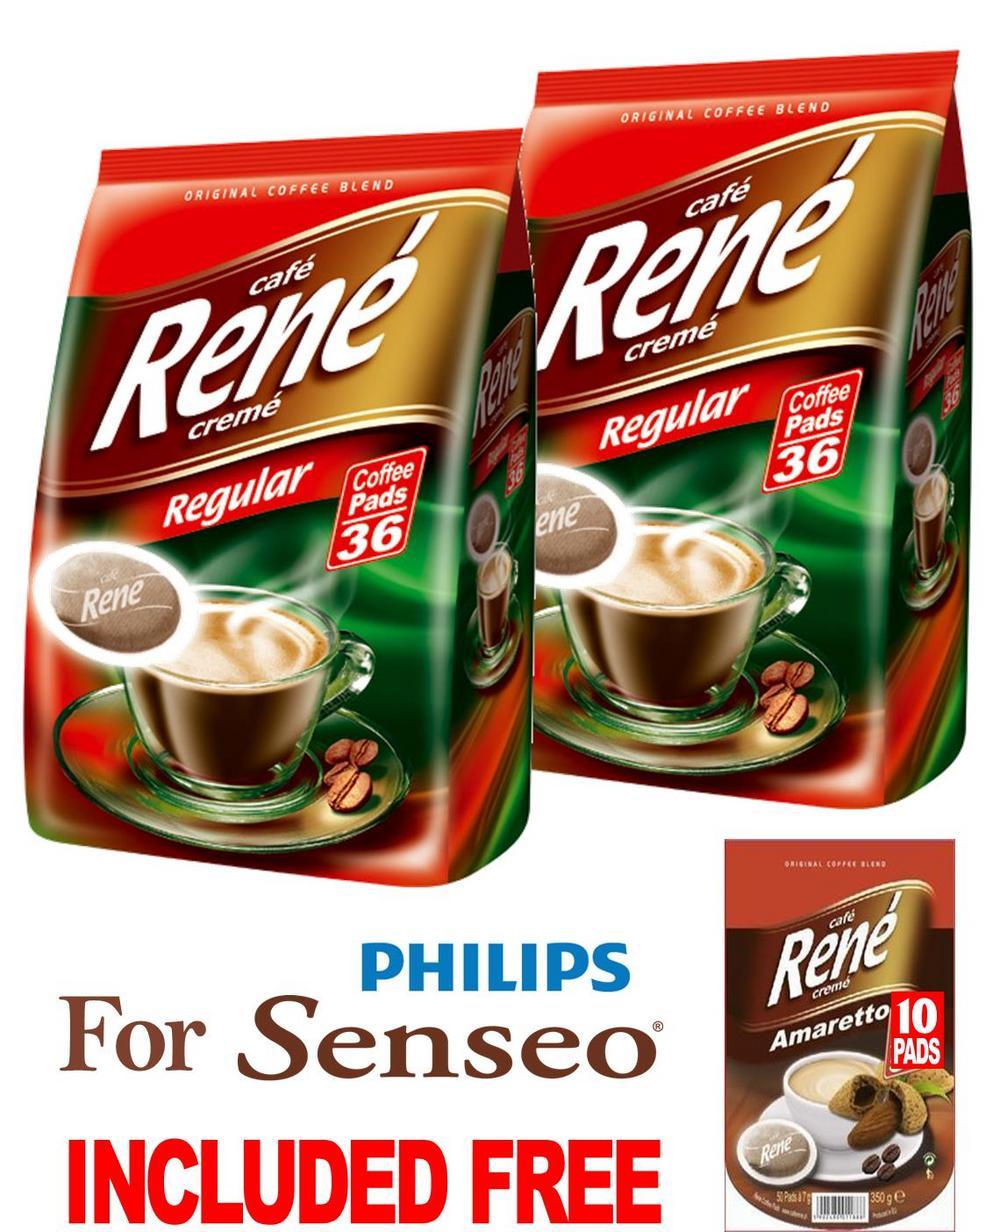 Philips Senseo 72 x Cafe Rene Cremé Regular Roast Coffee Pads Bags Pods